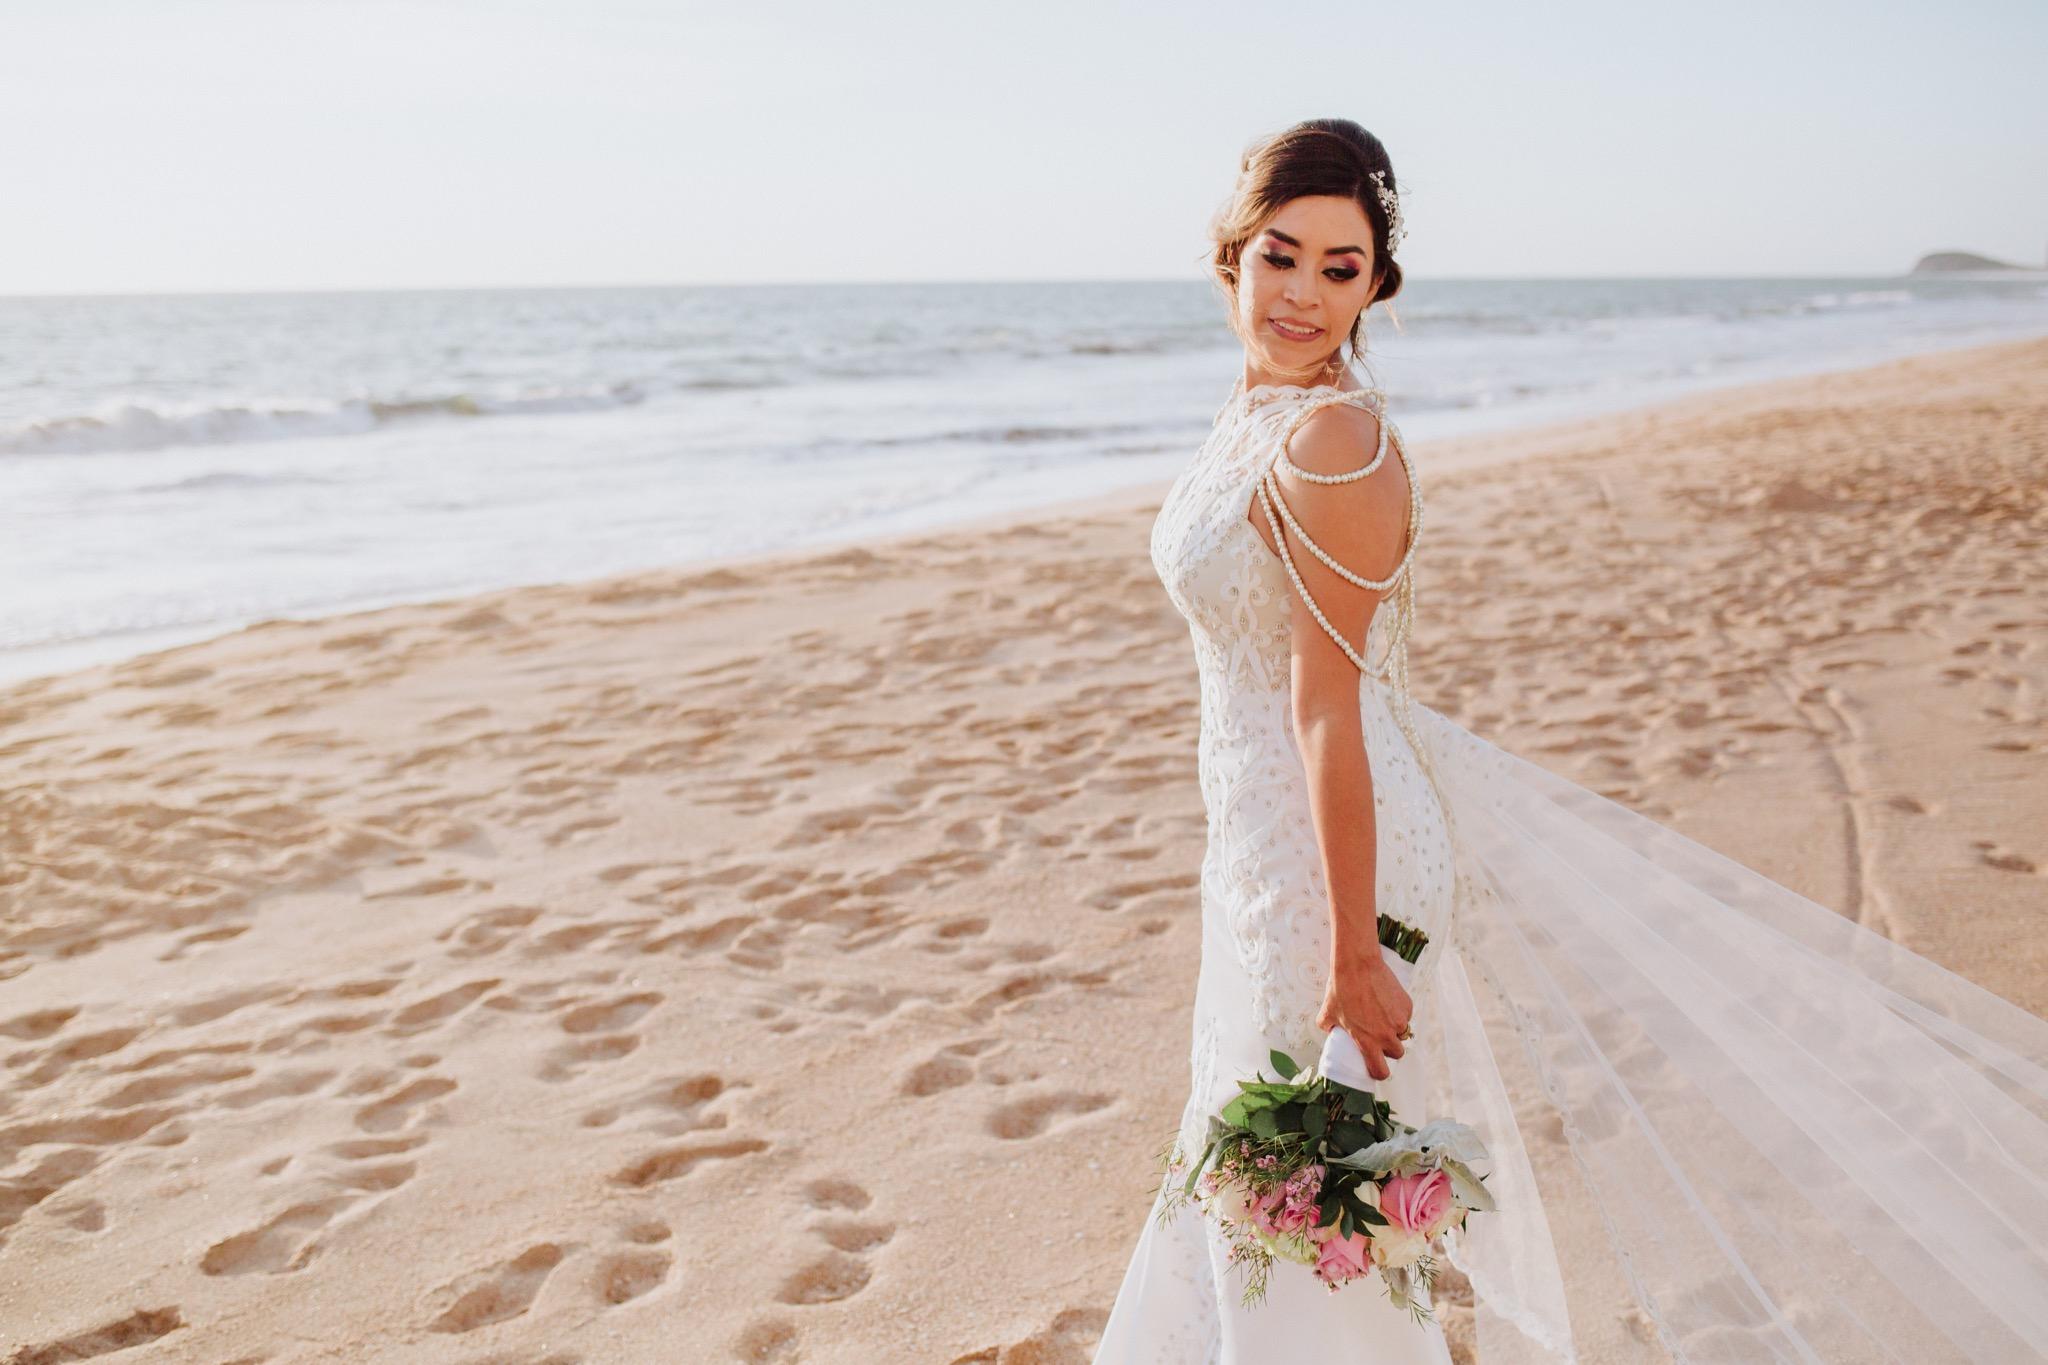 Javier_noriega_fotografo_bodas_profesional_zacatecas_mexico_mazatlan_sinaloa_photographer_weddings50